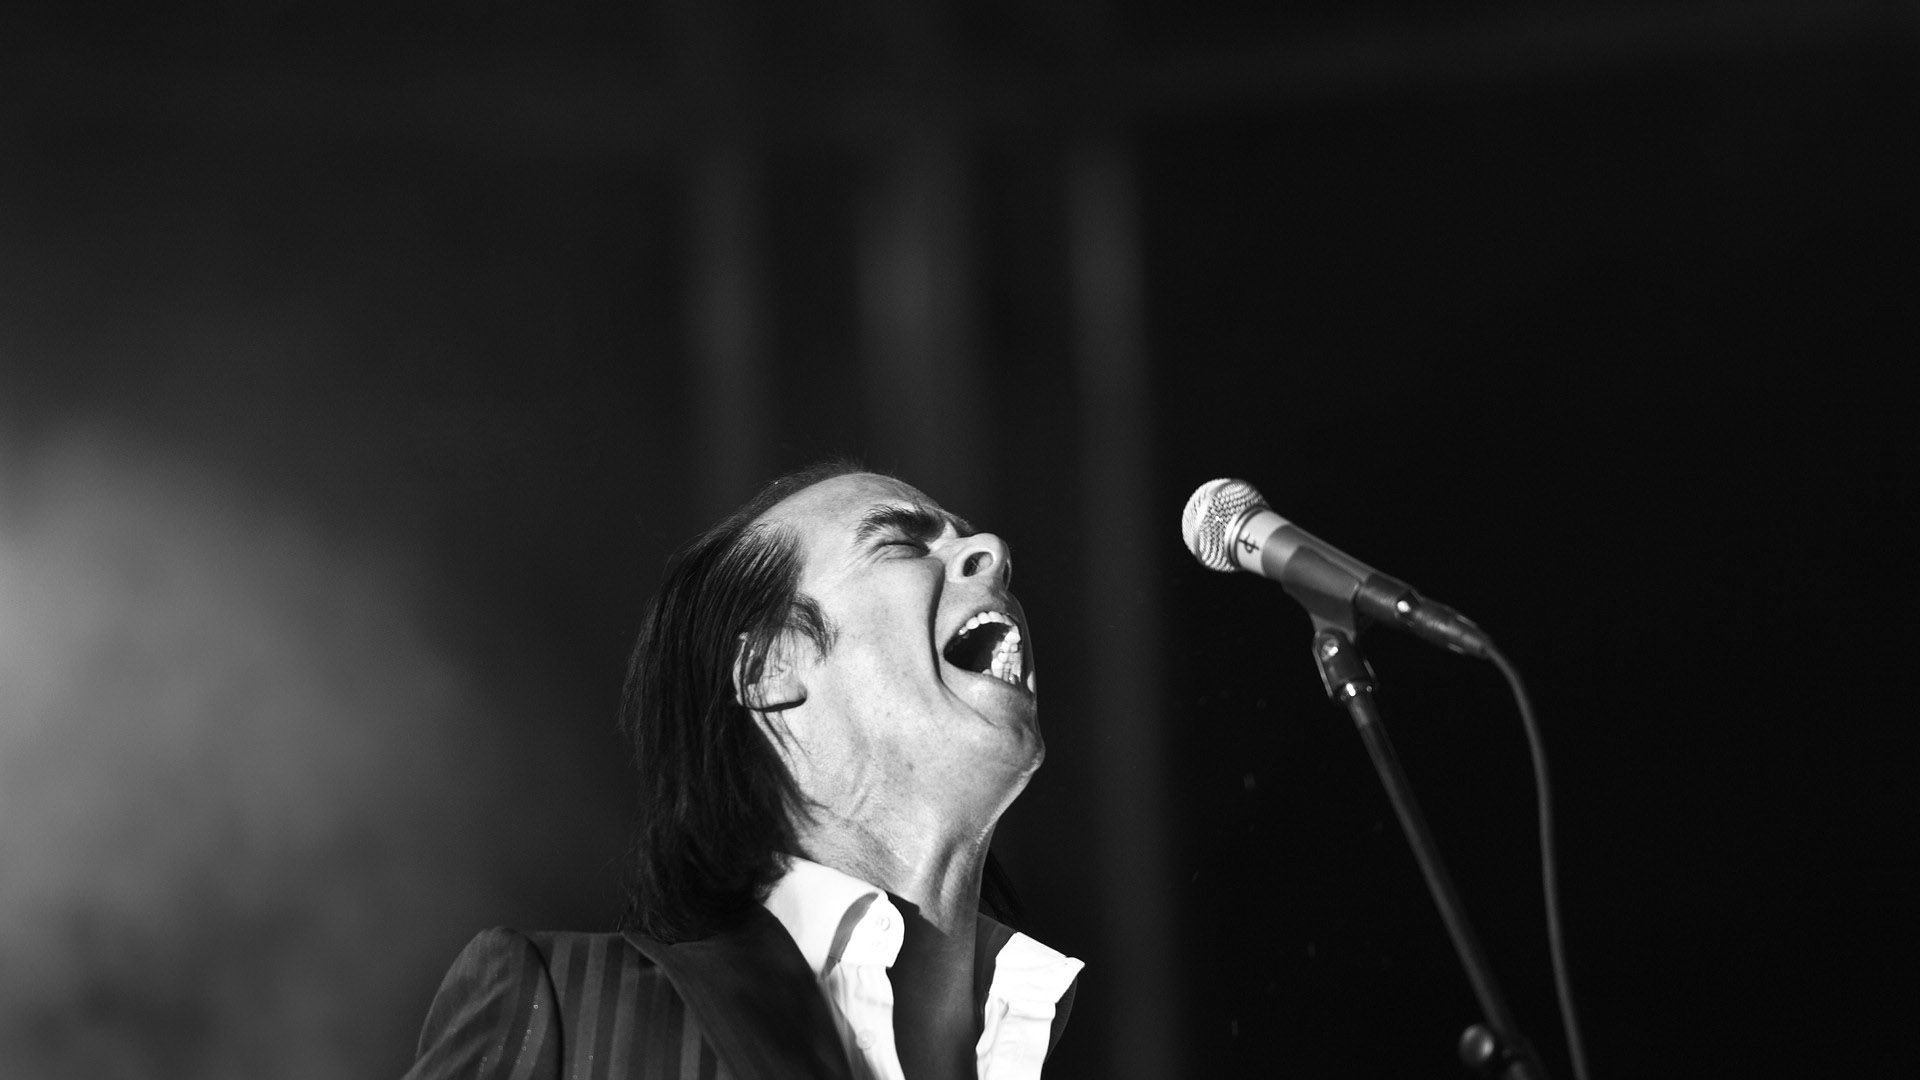 RTP2 exibe concerto de Nick Cave & The Bad Seeds na Royal Arena de Copenhaga